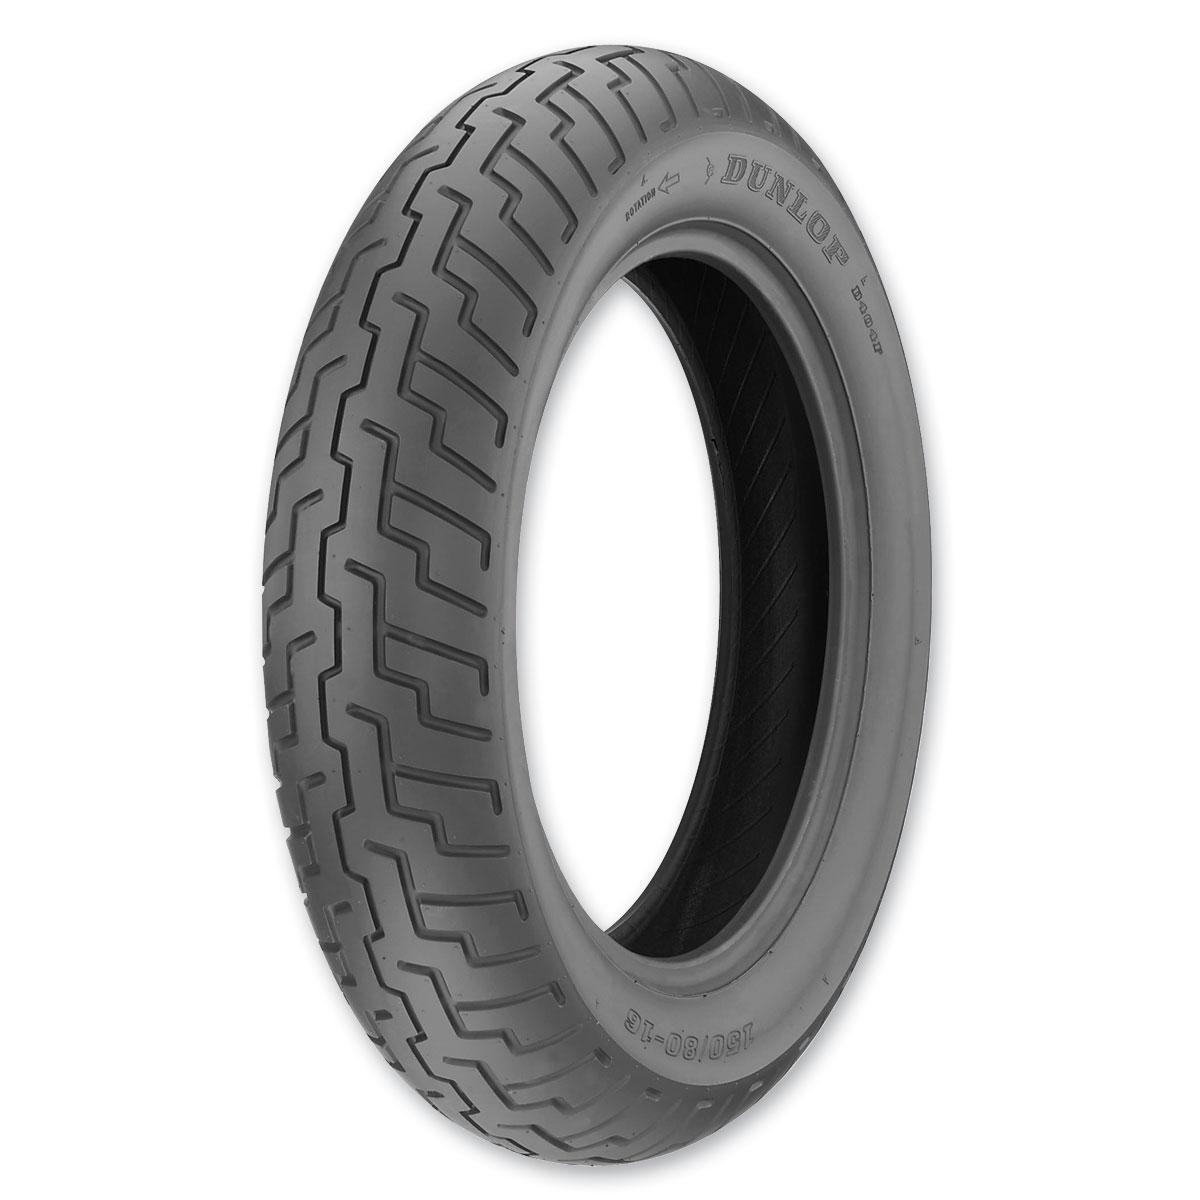 Dunlop D404 130/90-16 Front Tire